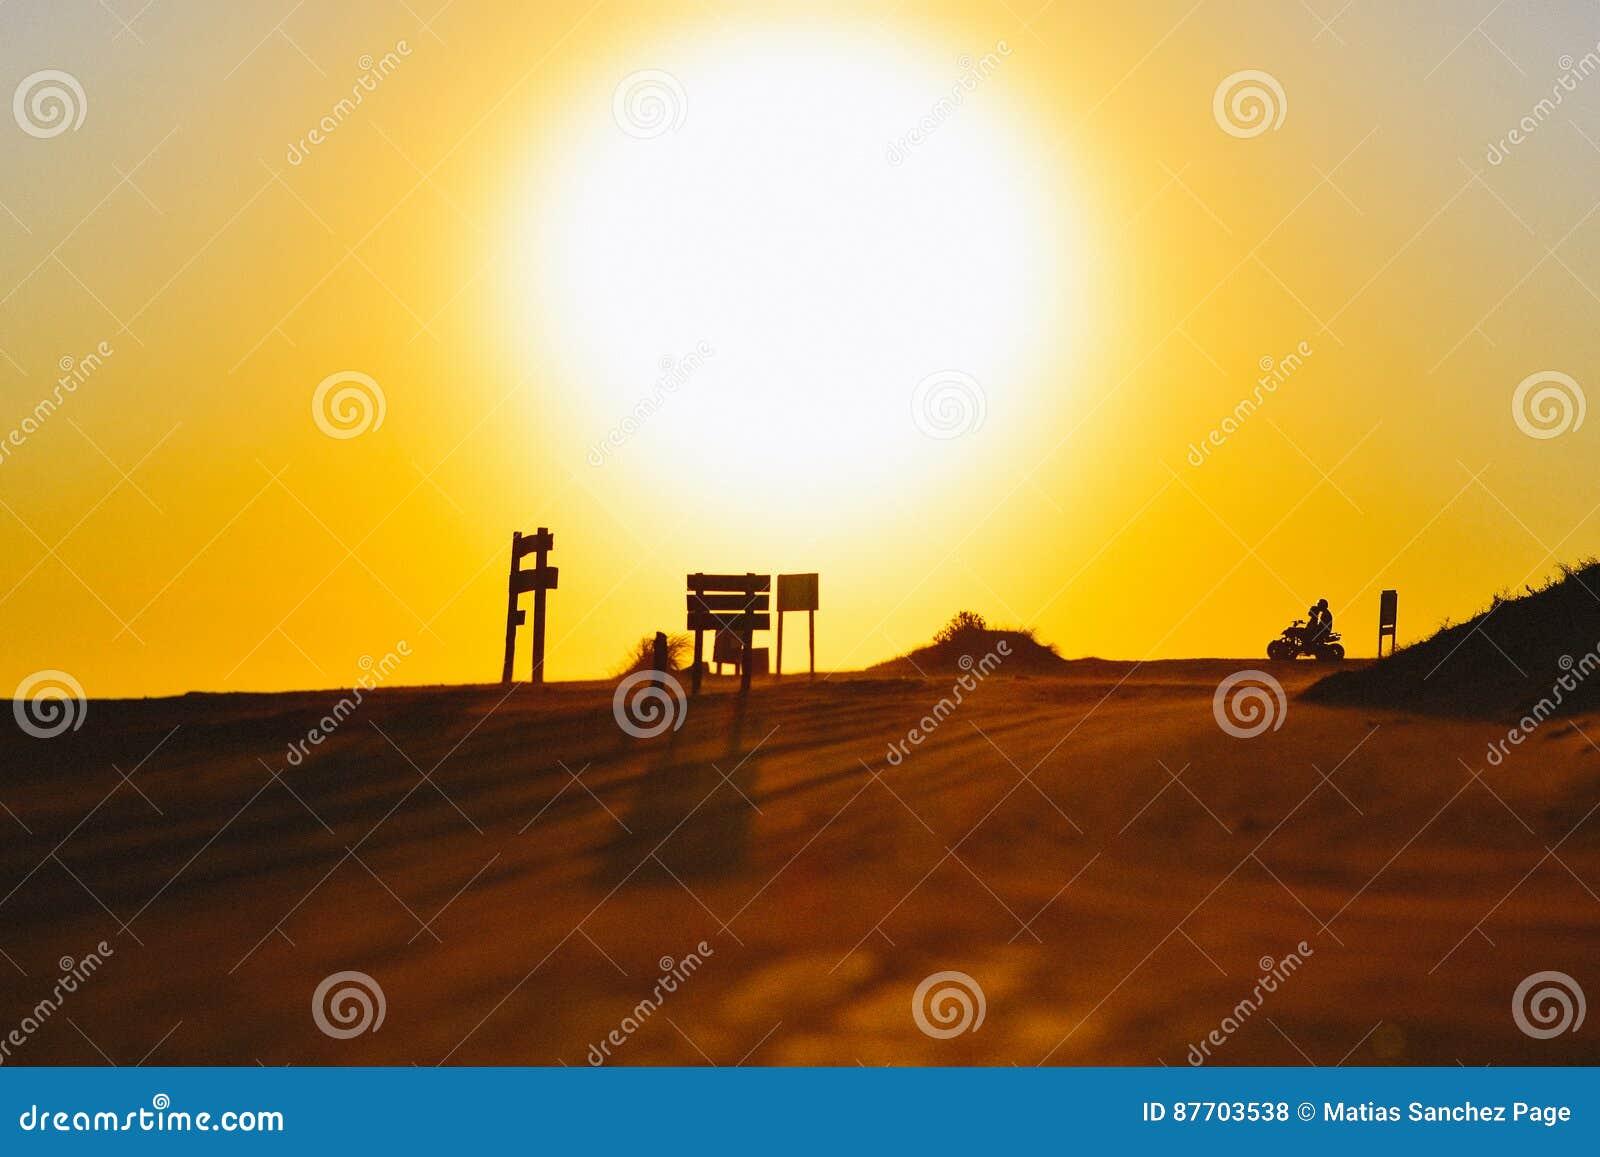 Cyclistes regardant fixement le soleil